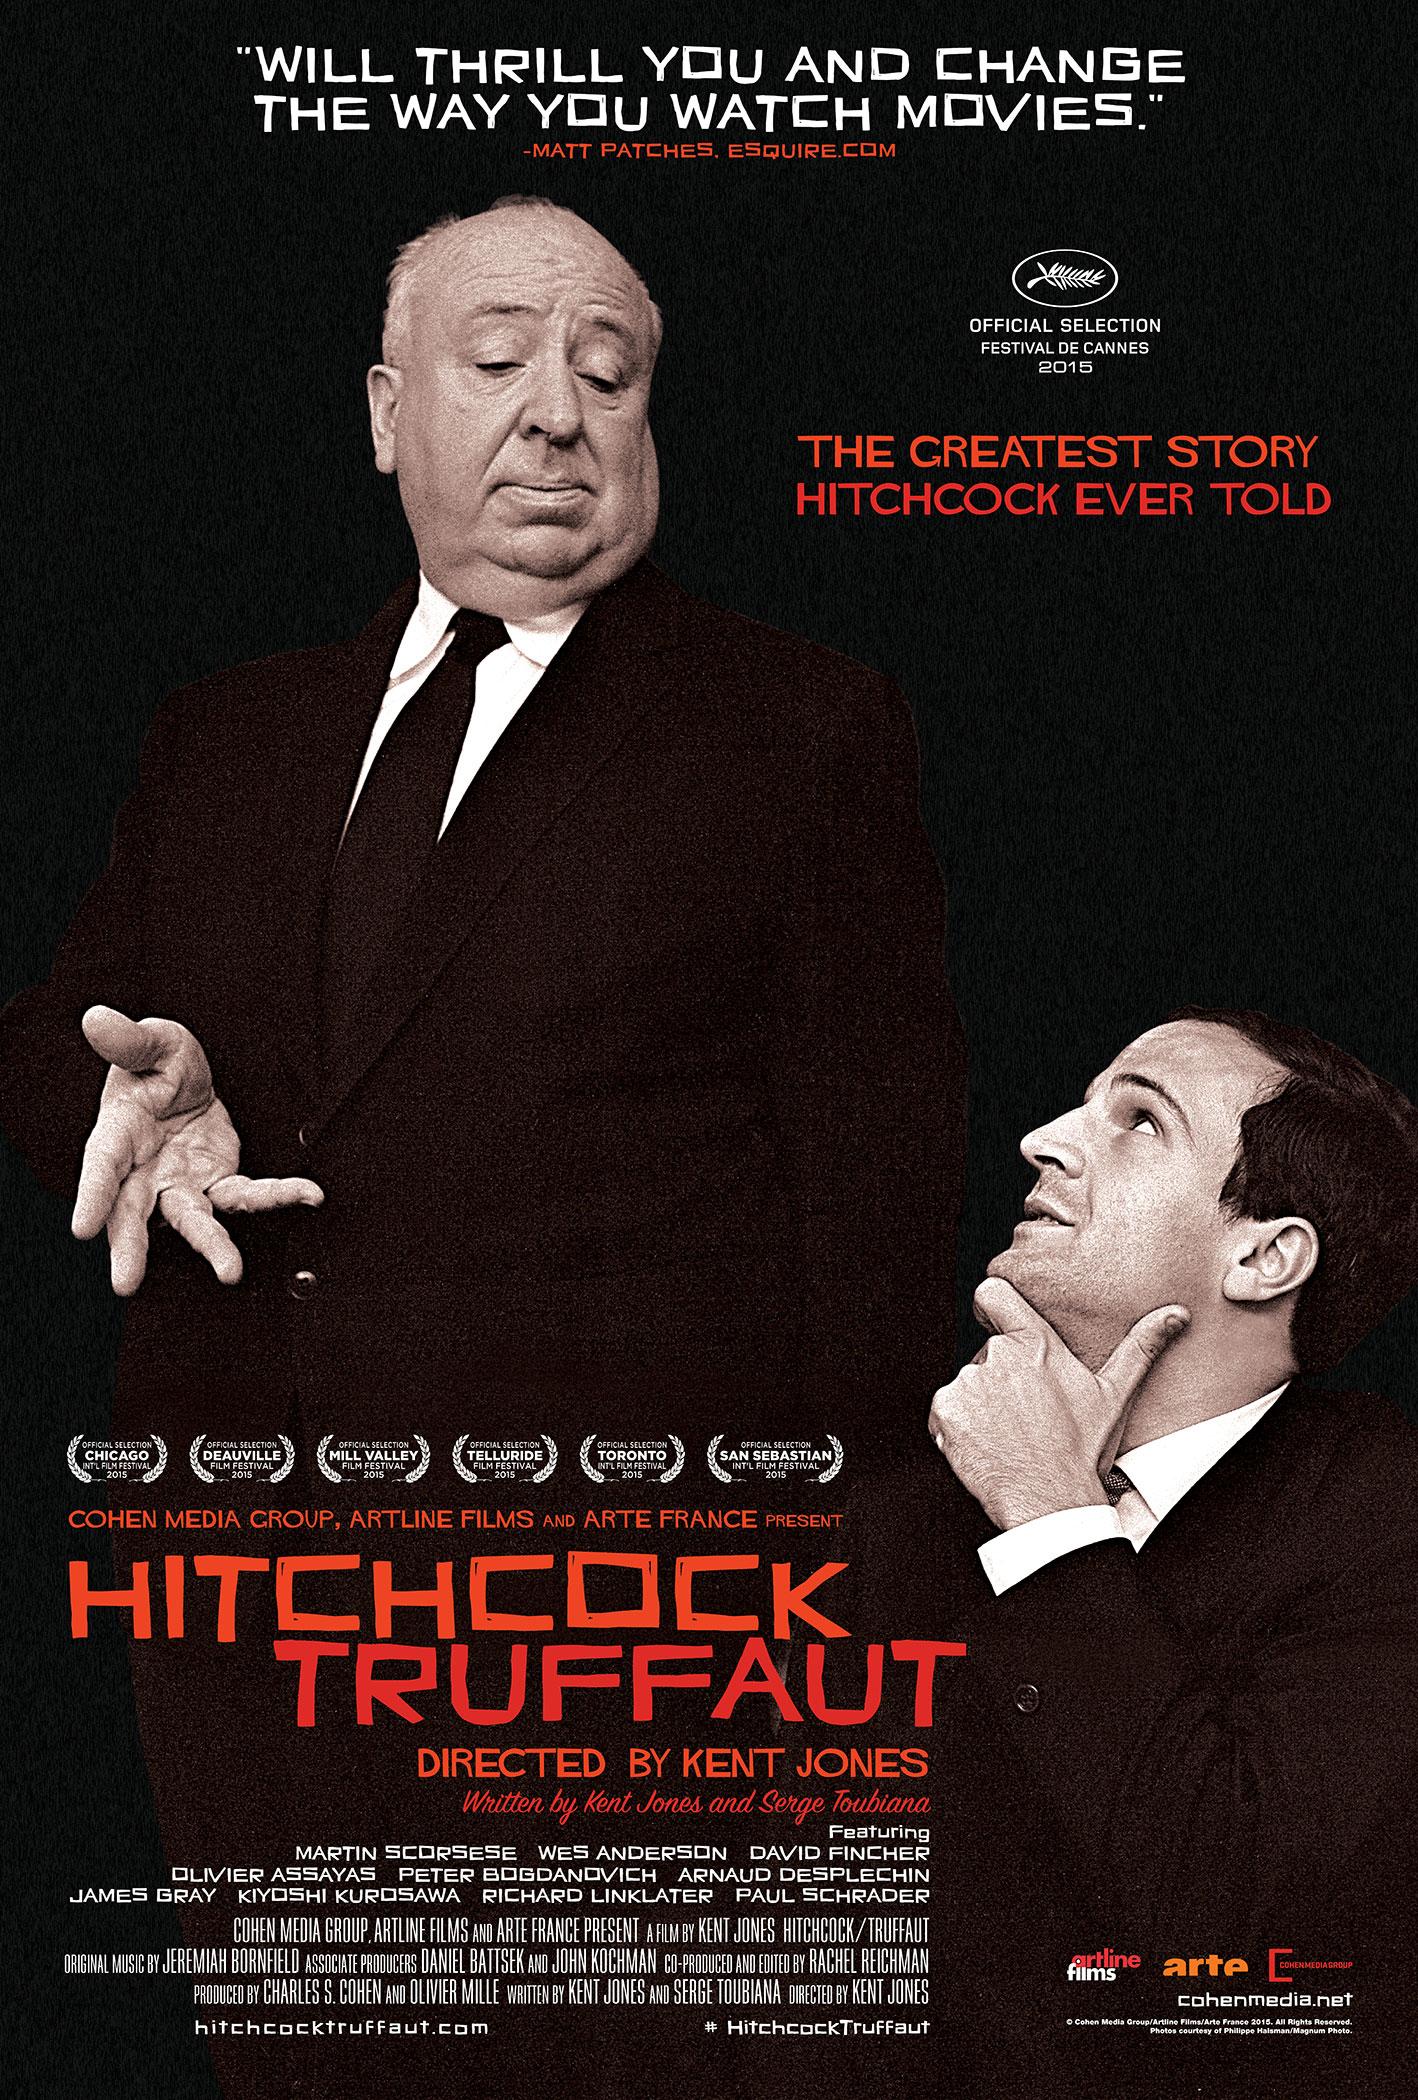 HitchcockTruffaut_poster.jpg